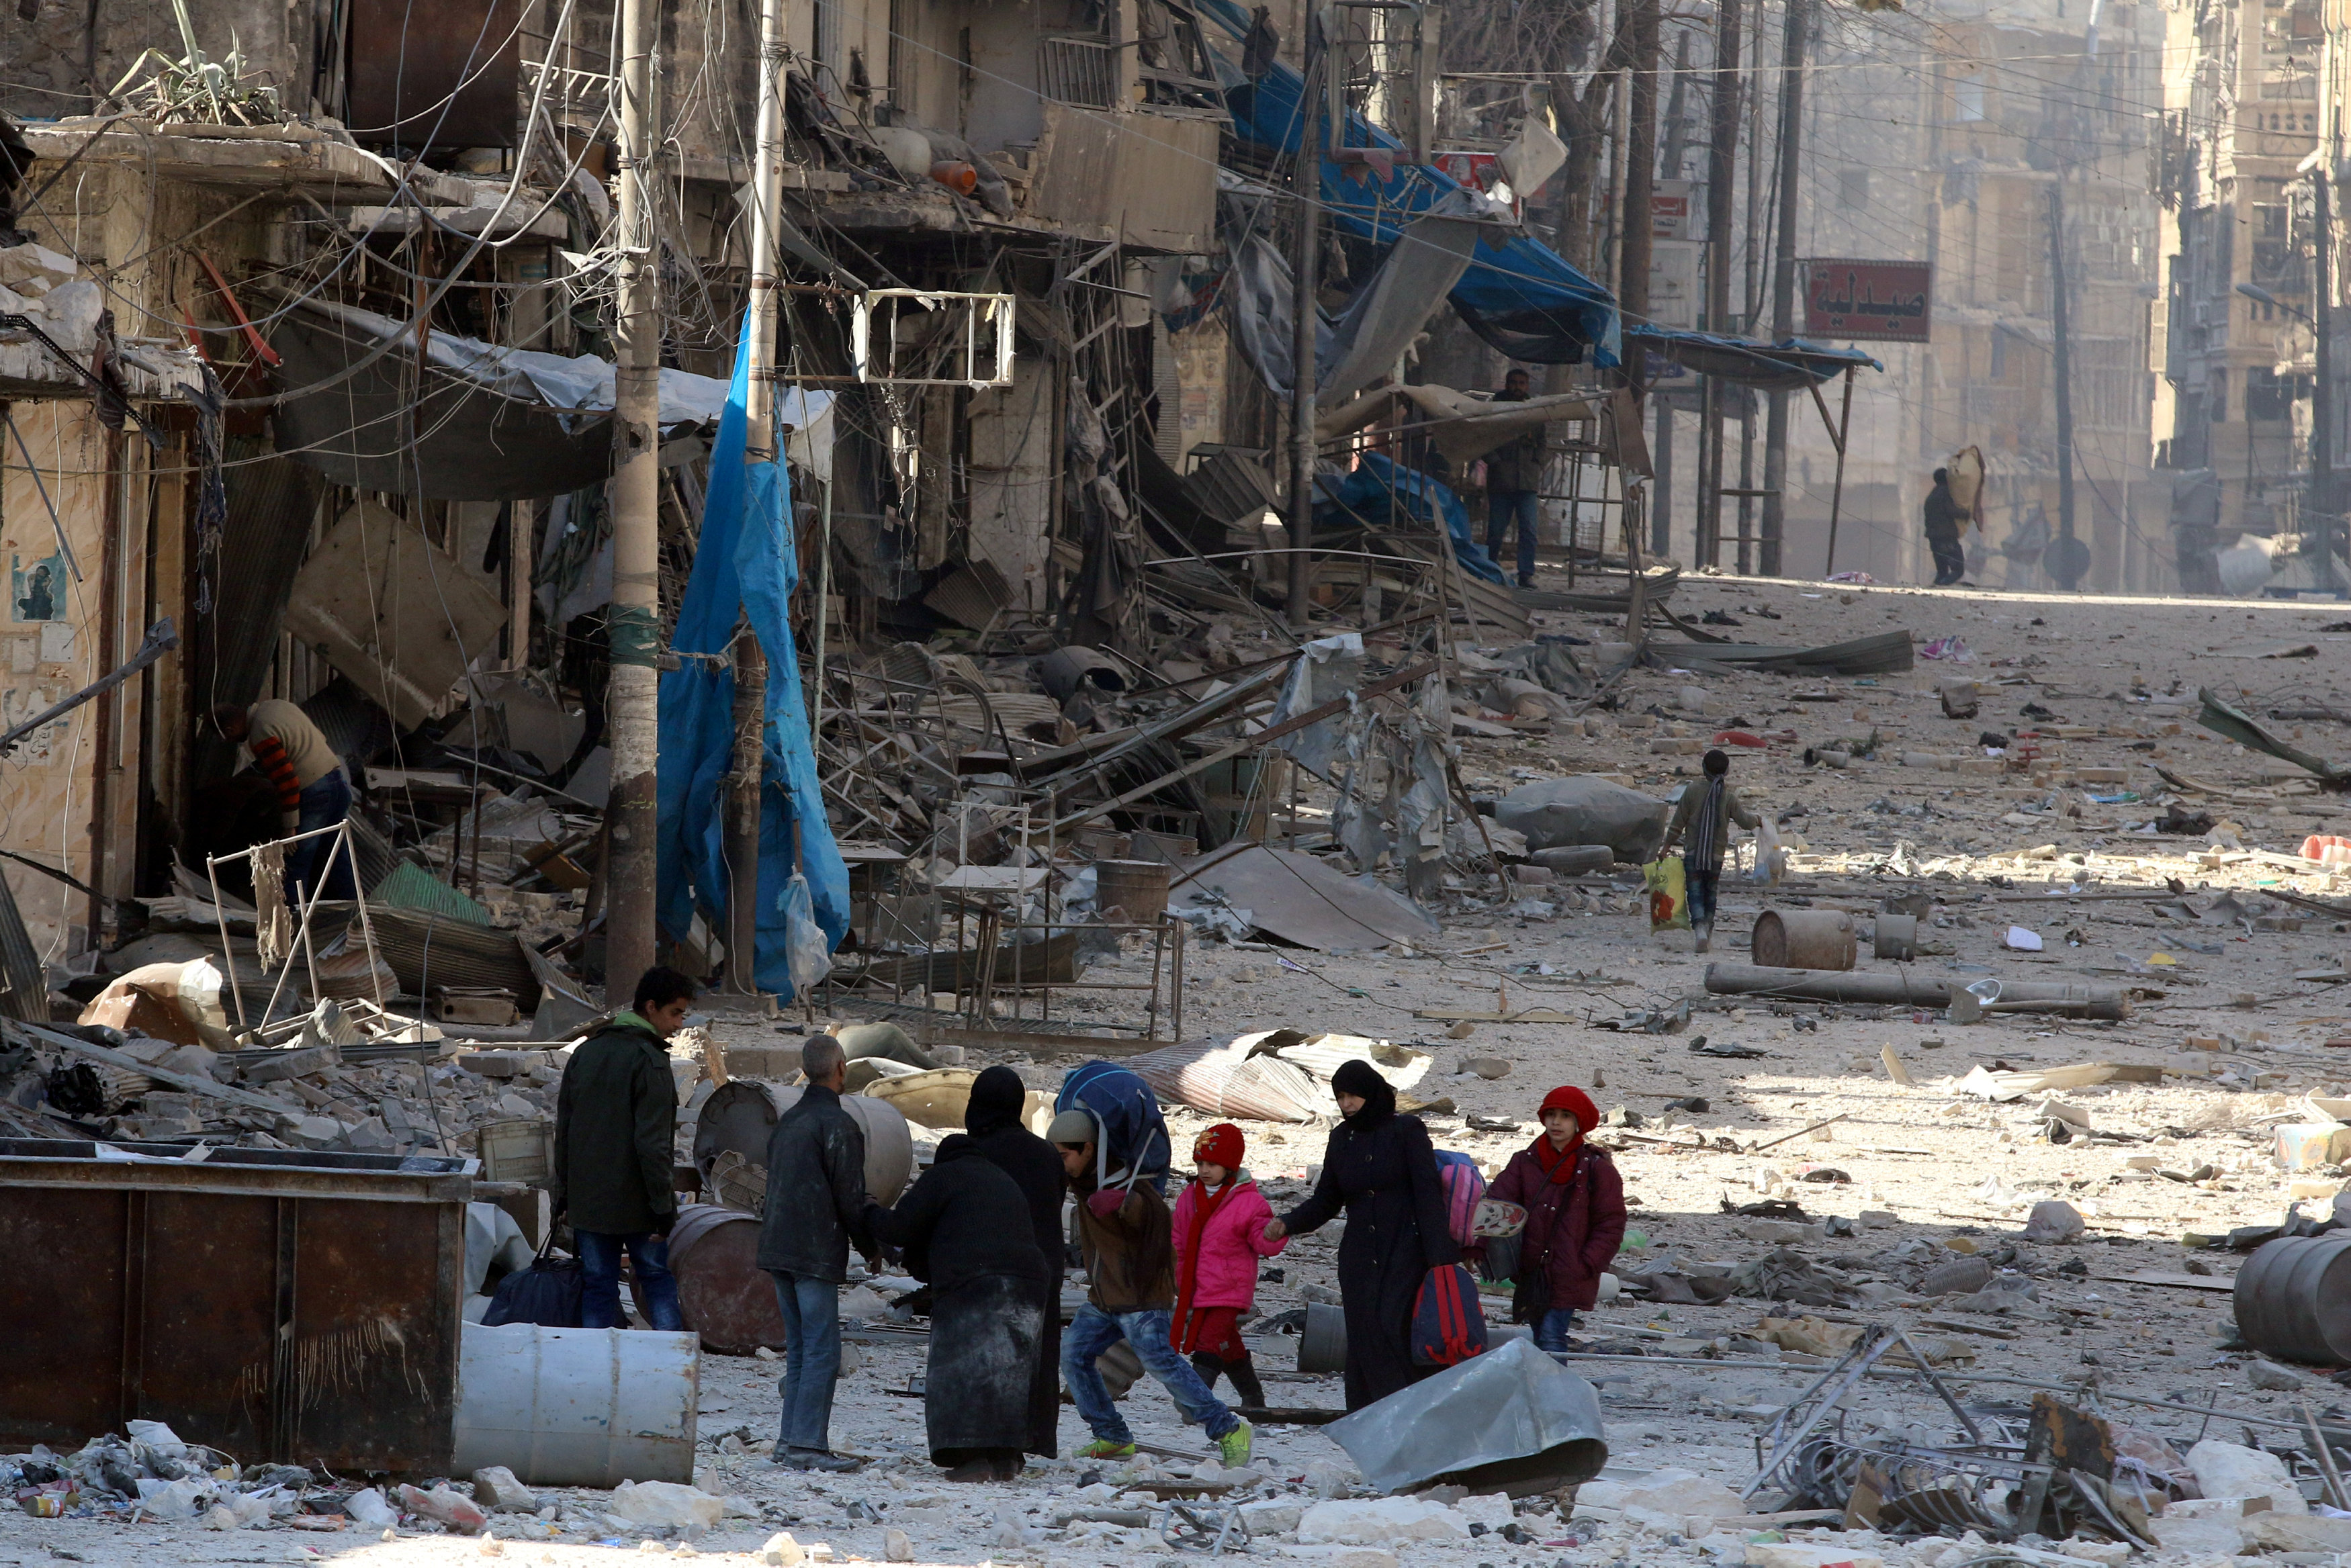 2016 12 14T143607Z 1589199887 RC1F691B13B0 RTRMADP 3 MIDEAST CRISIS SYRIA ALEPPO FALL copy